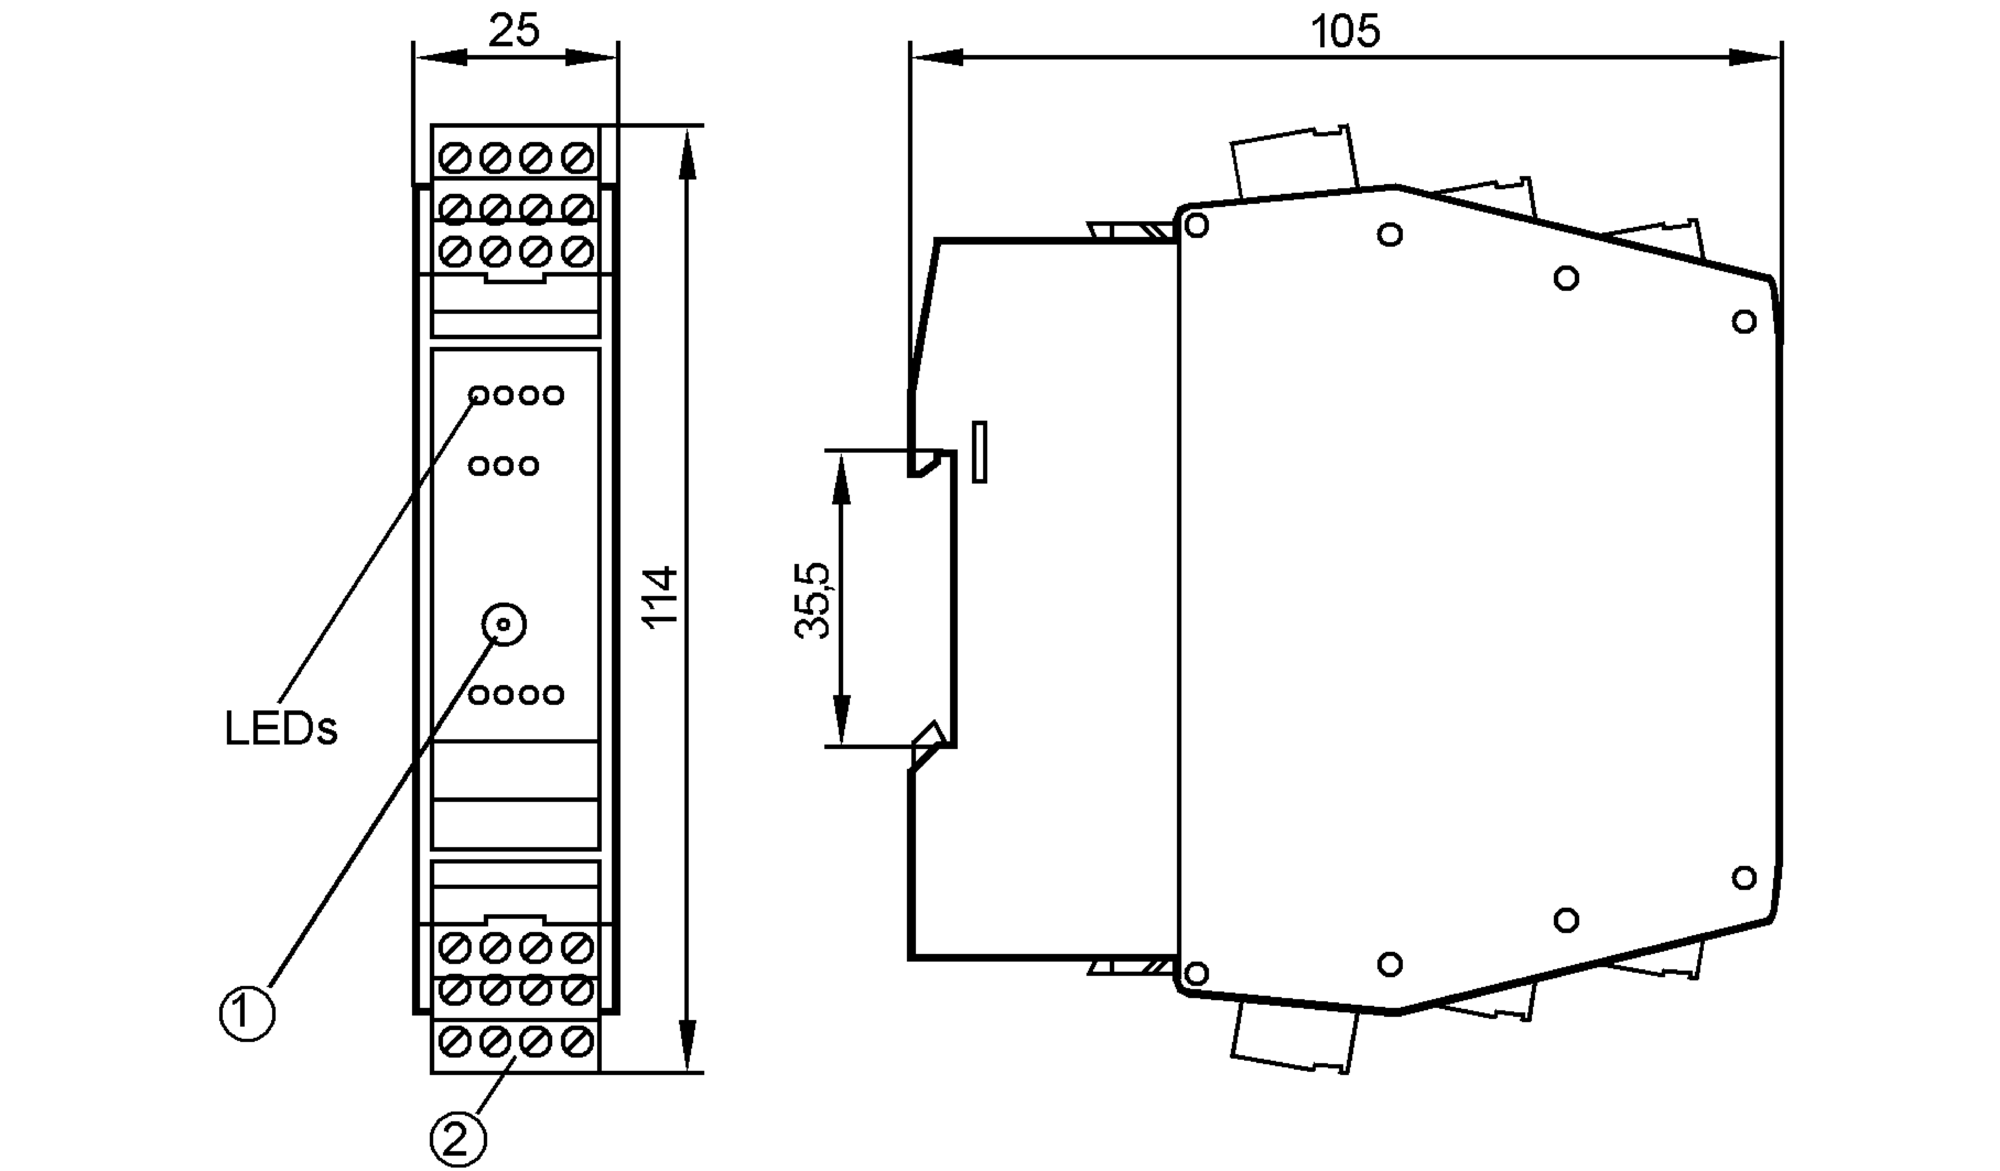 ac2266 - as-interface control cabinet module